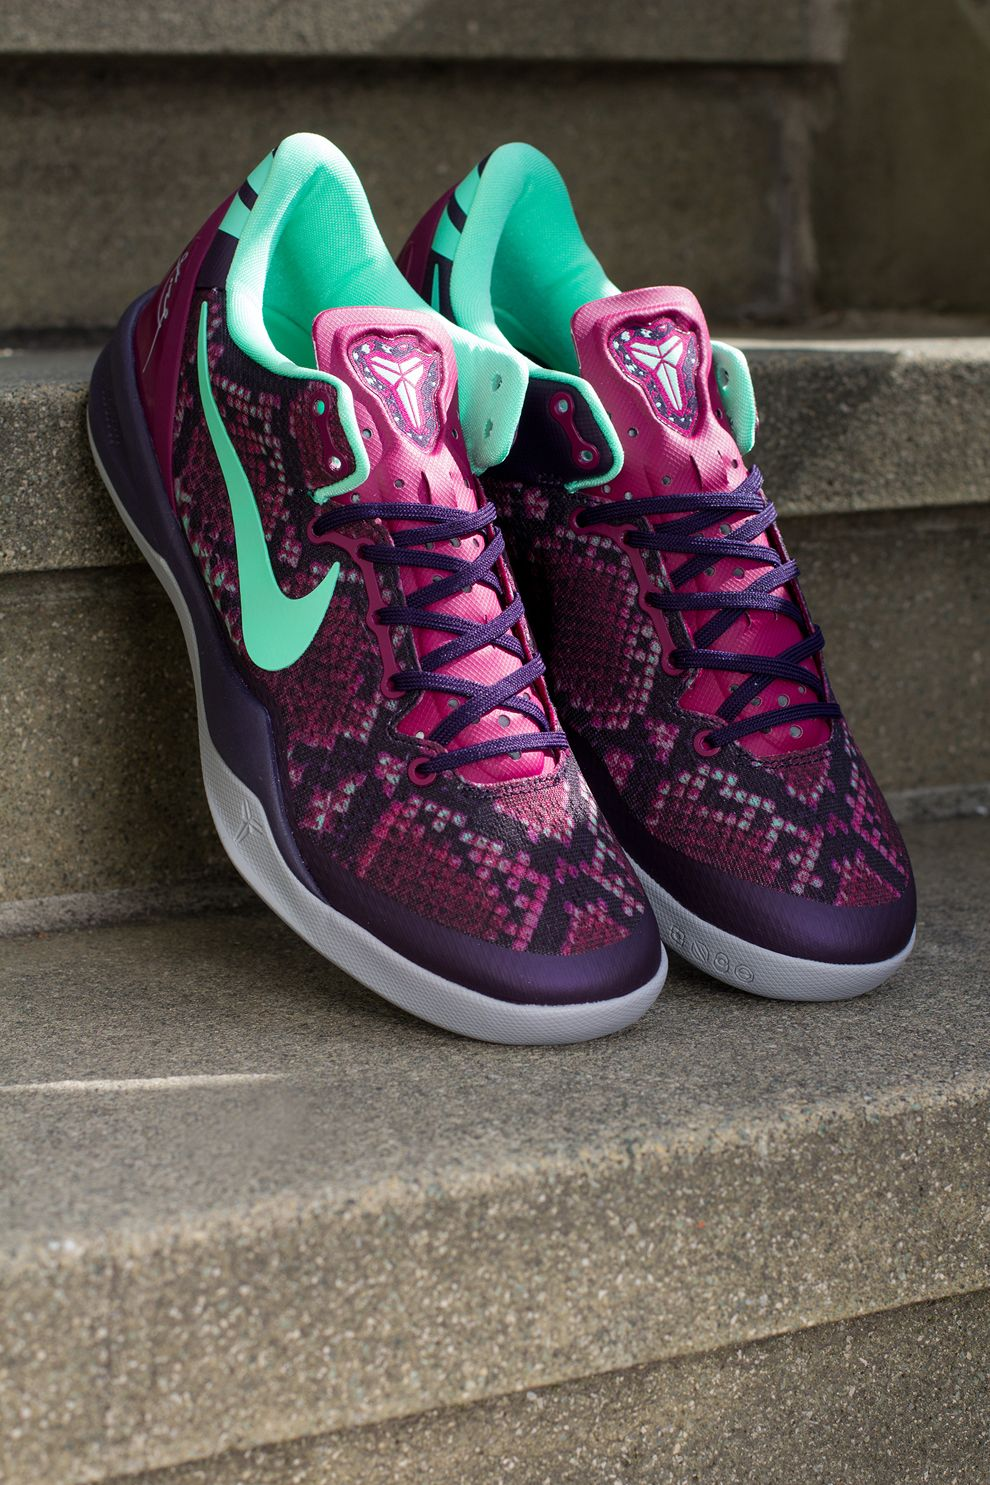 Nike Kobe 8 'Pit Viper' (Detailed Pics